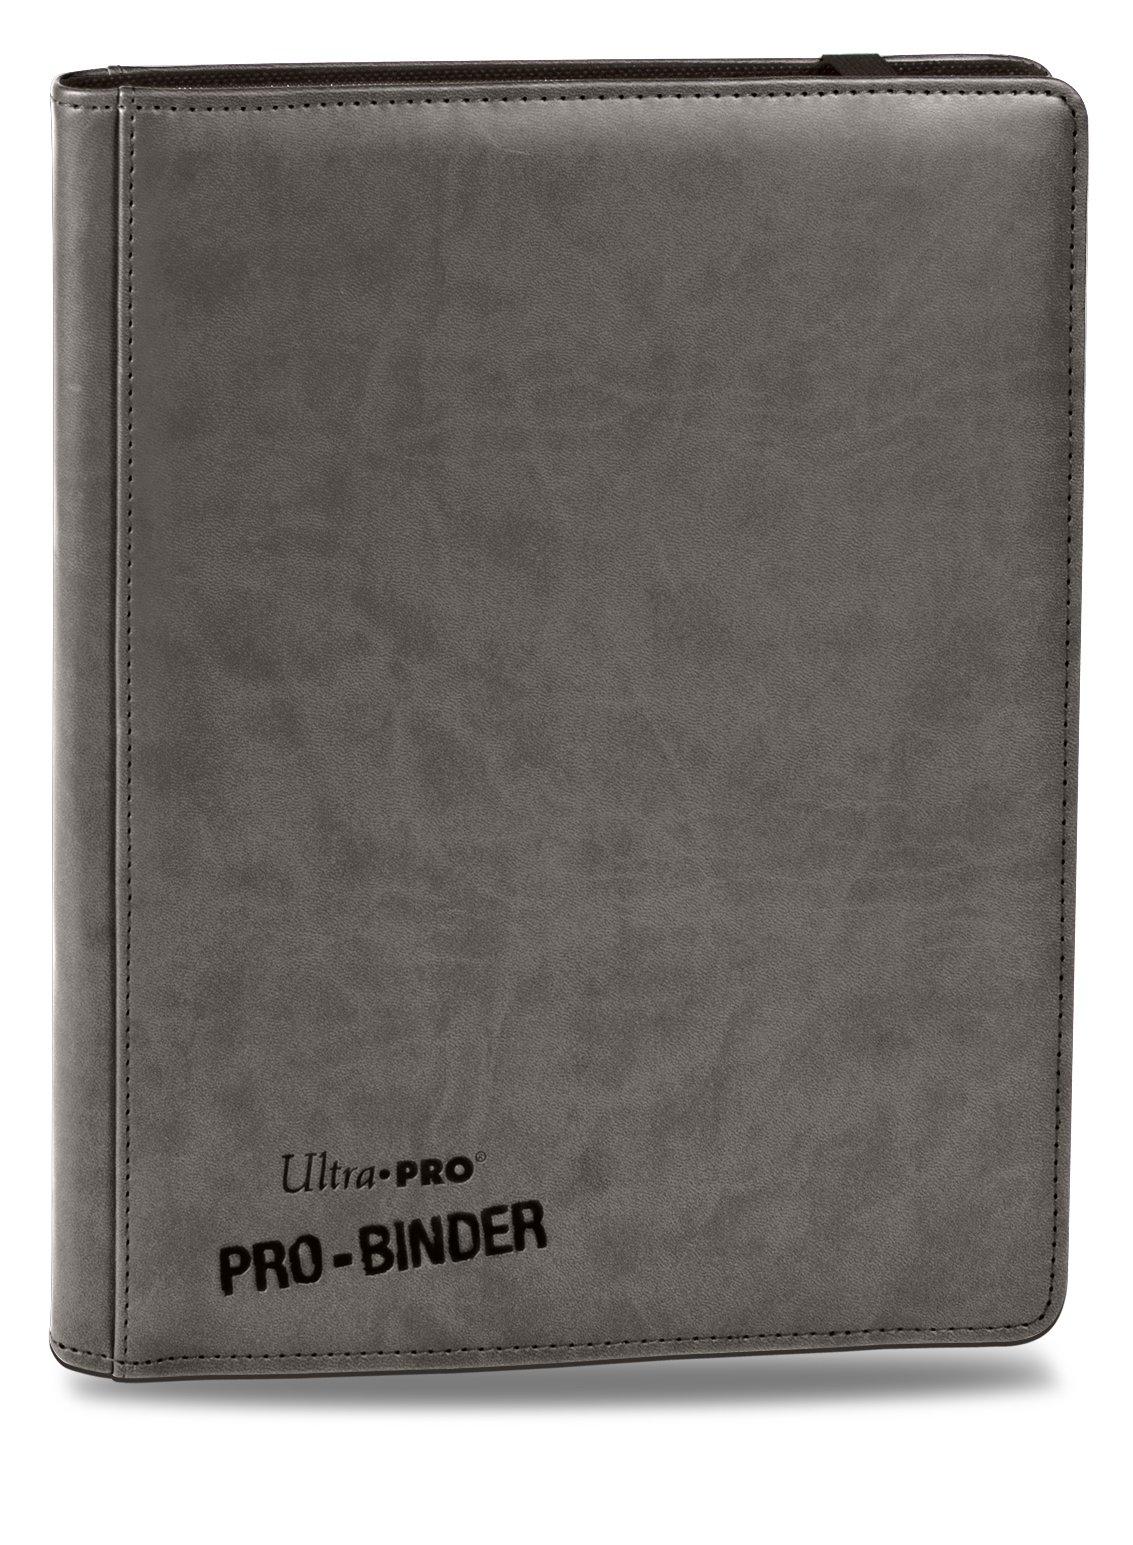 Premium PRO-Binder (9-Pocket), Grey